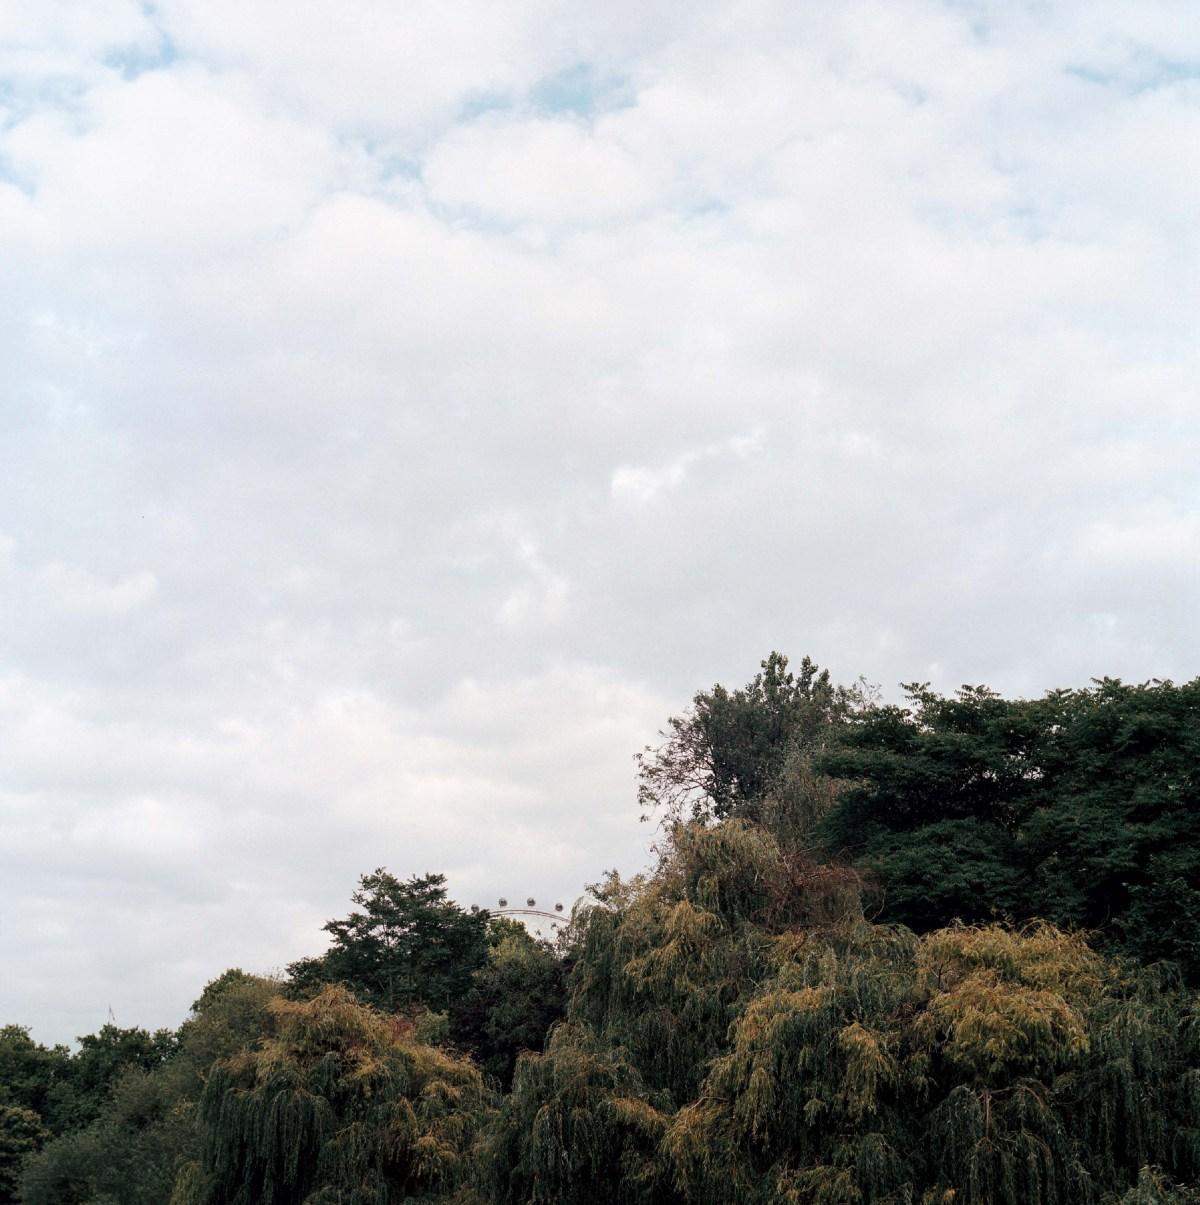 01-GabrieleDiStefano-Wherethetreesgrow copy